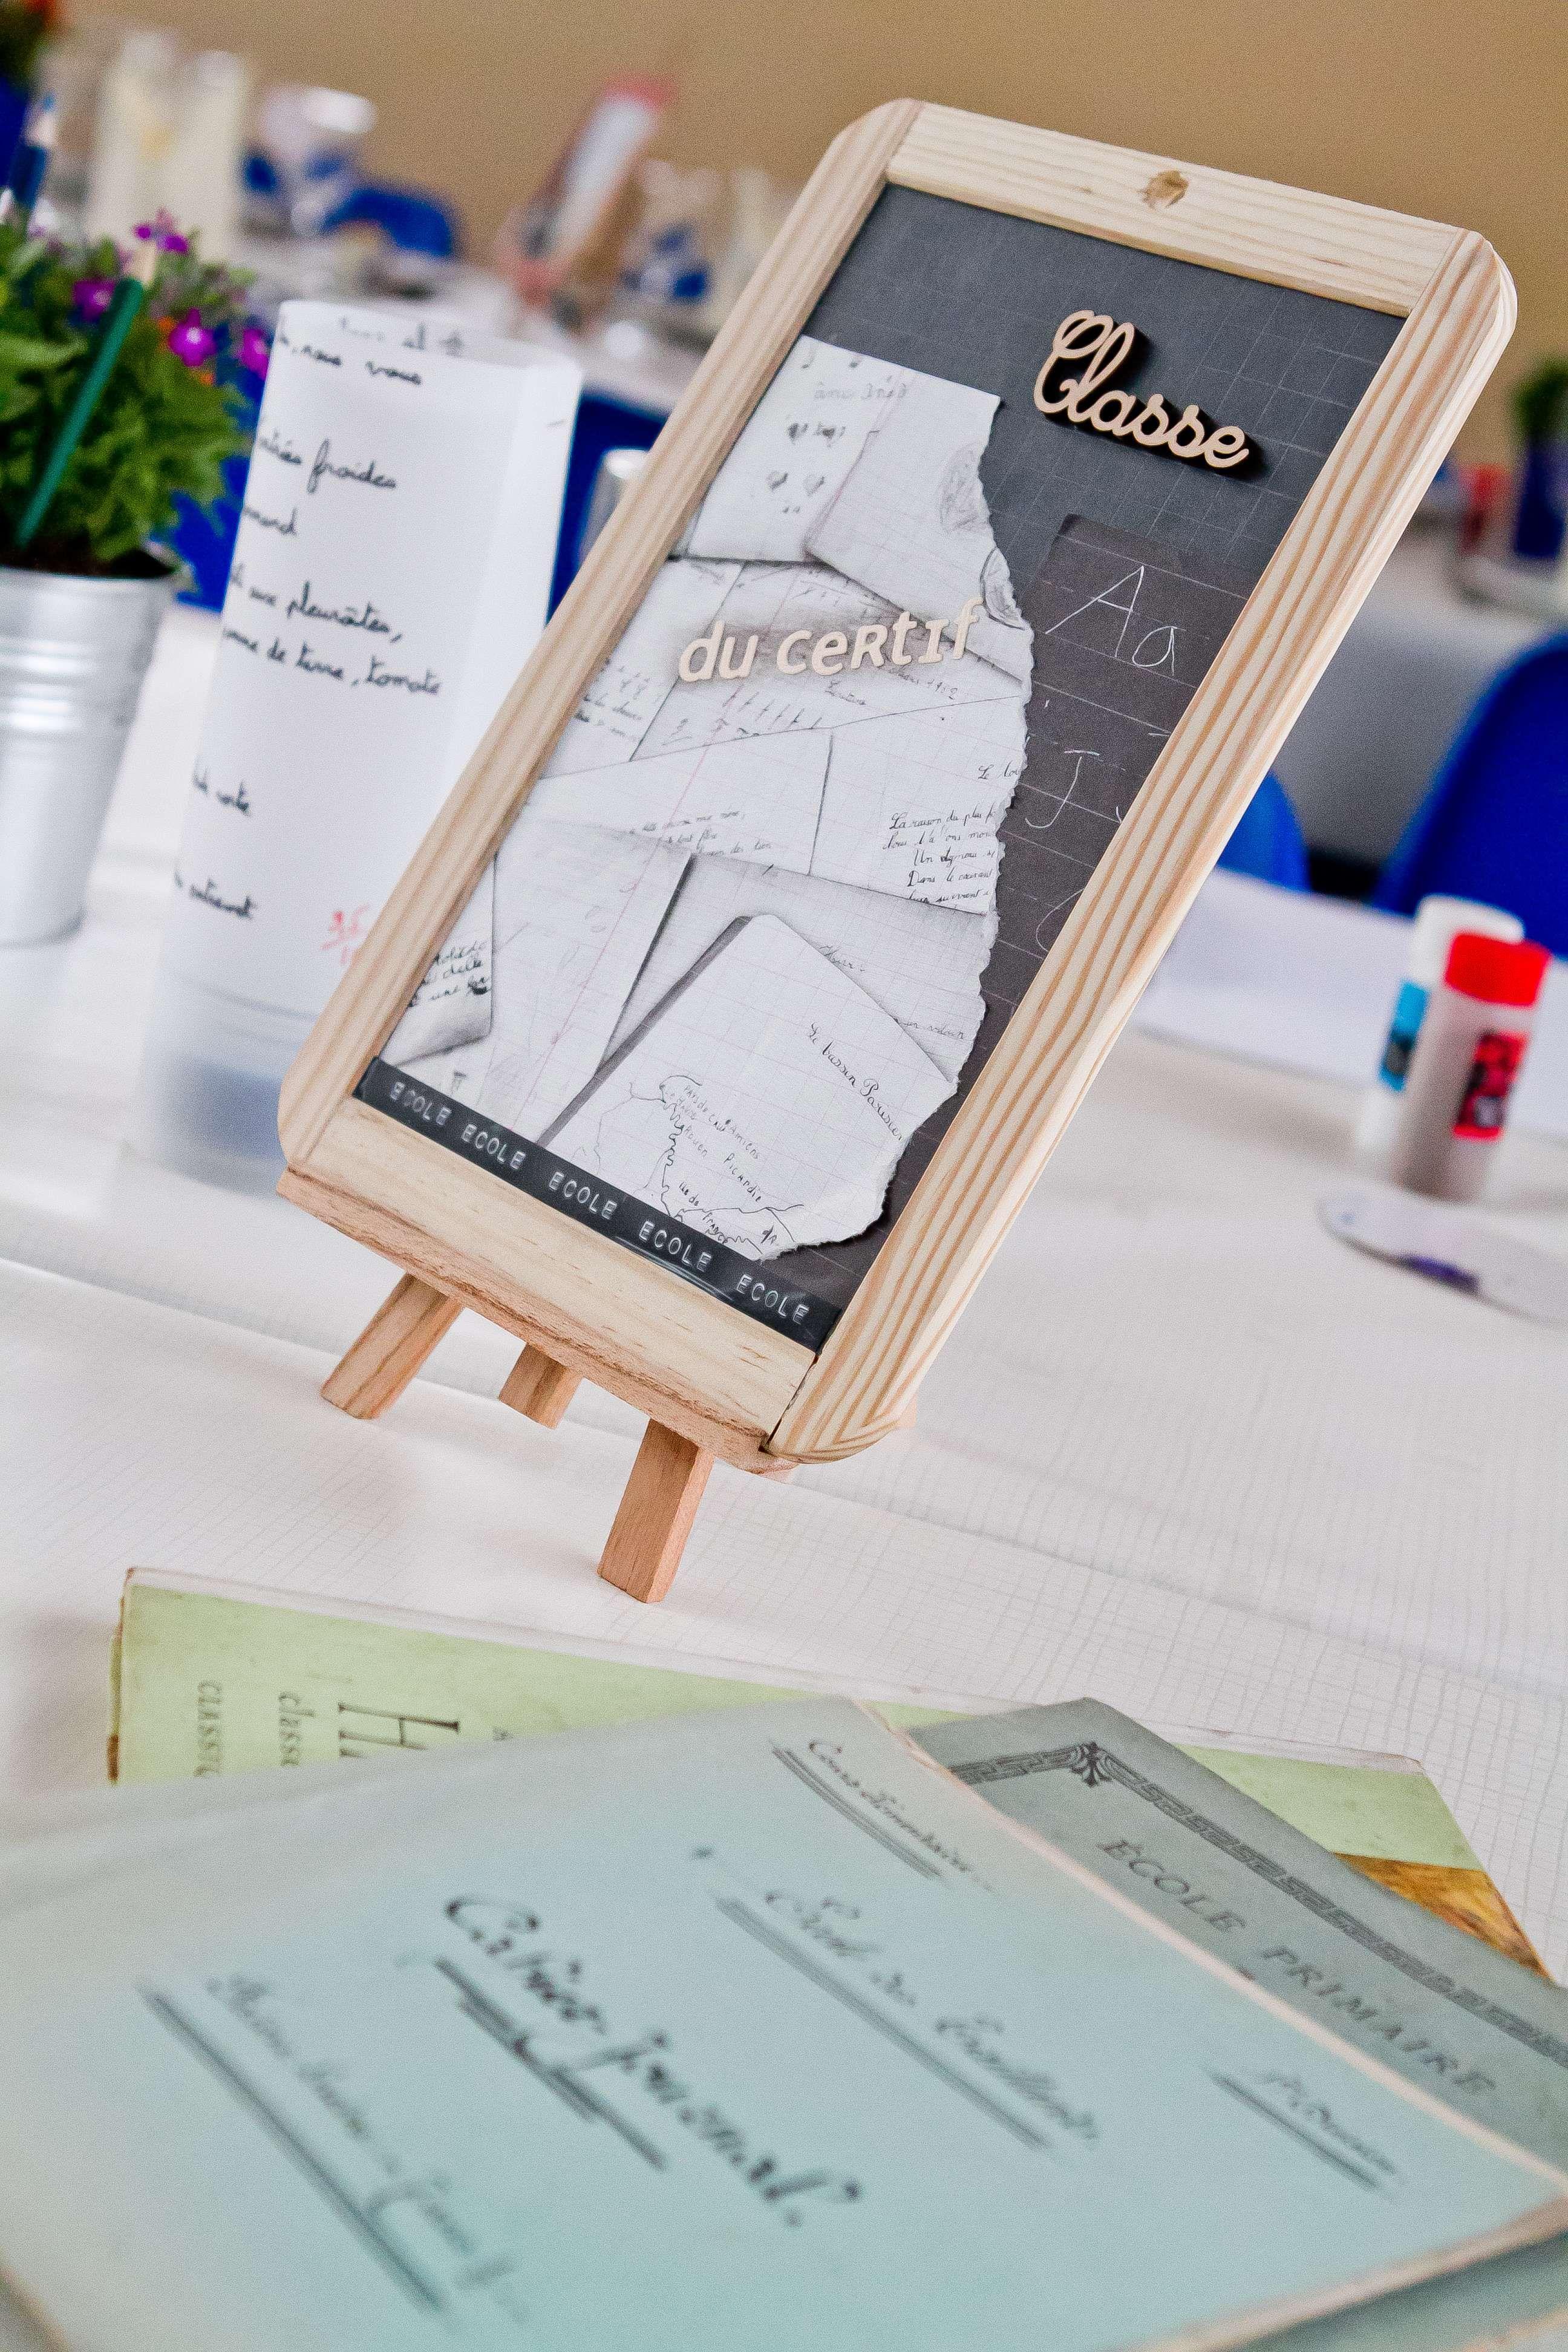 decoration de table ecole. Black Bedroom Furniture Sets. Home Design Ideas